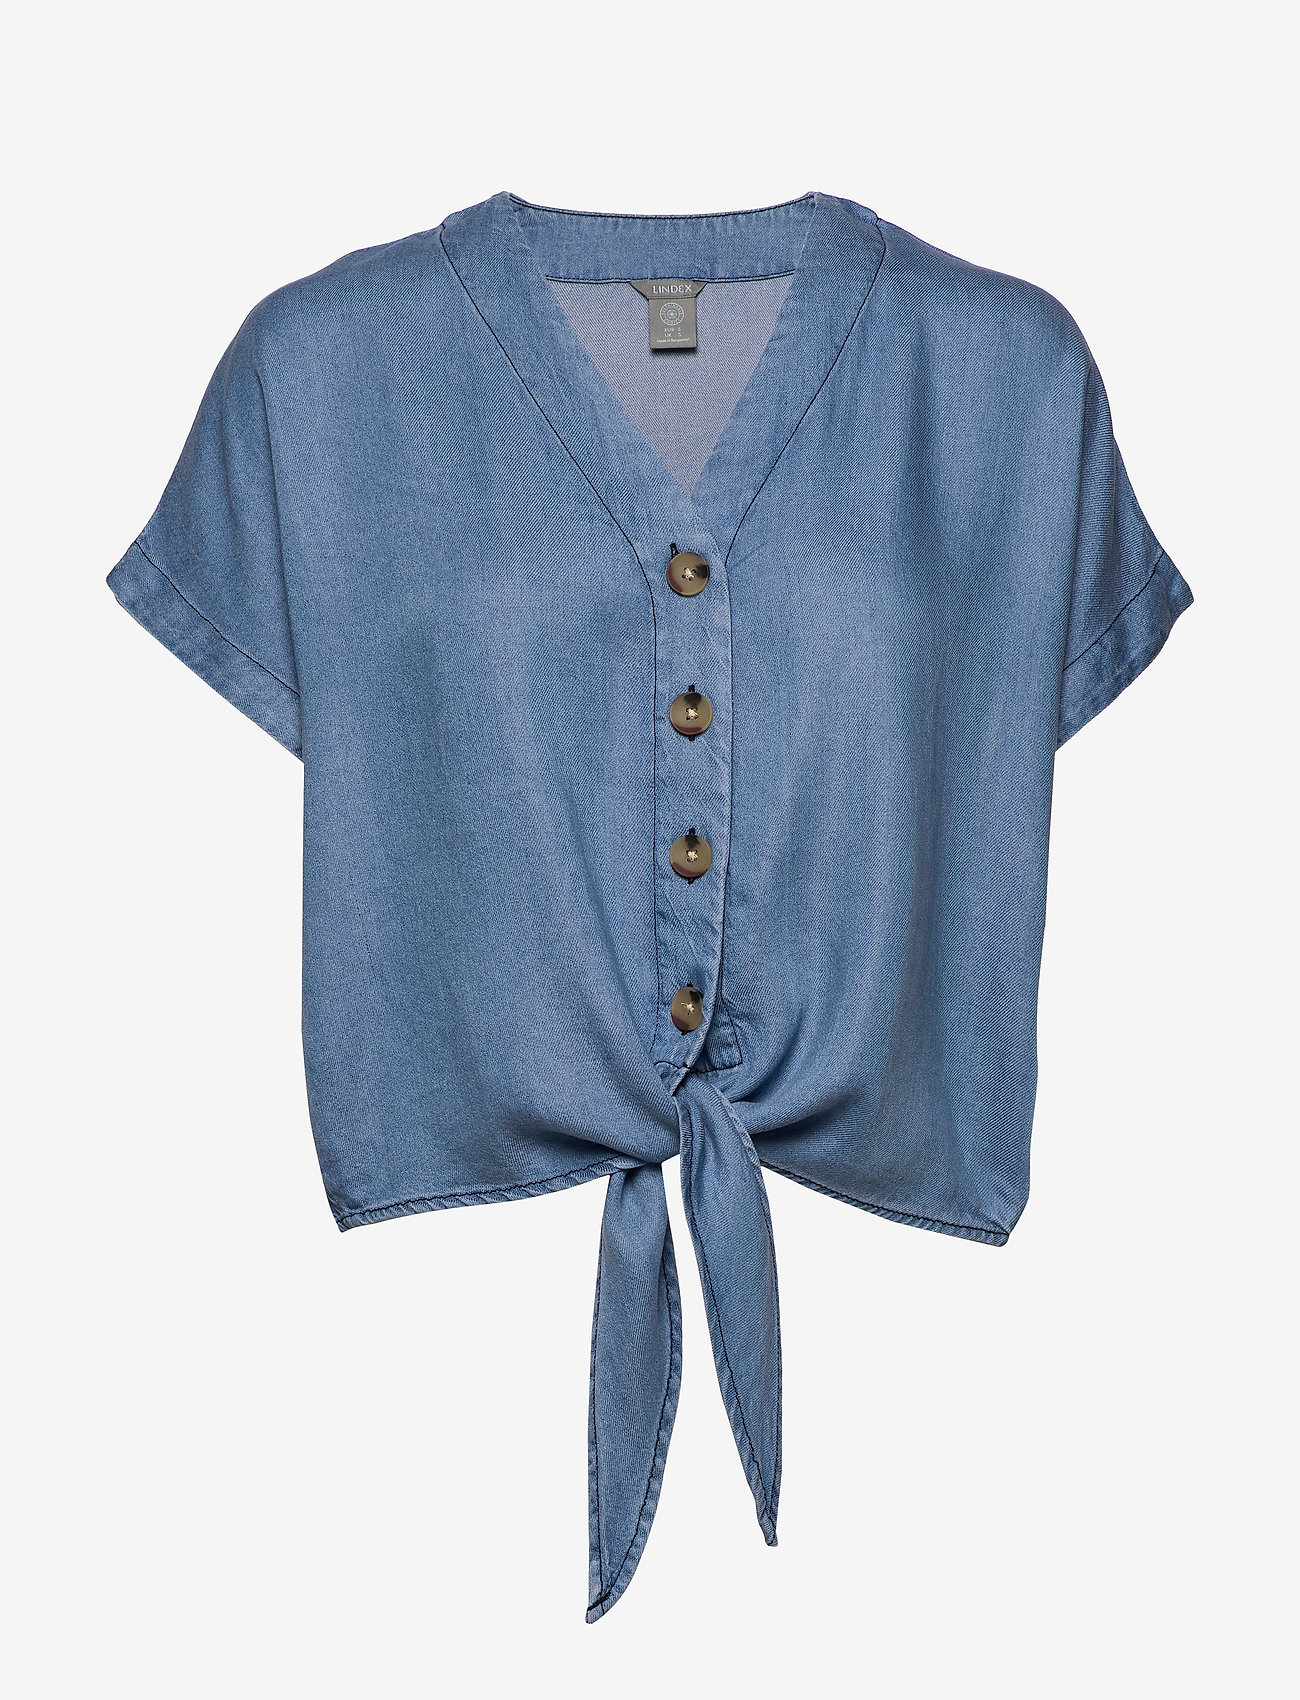 Lindex - Blouse Julia denim - short-sleeved blouses - denim blue - 0